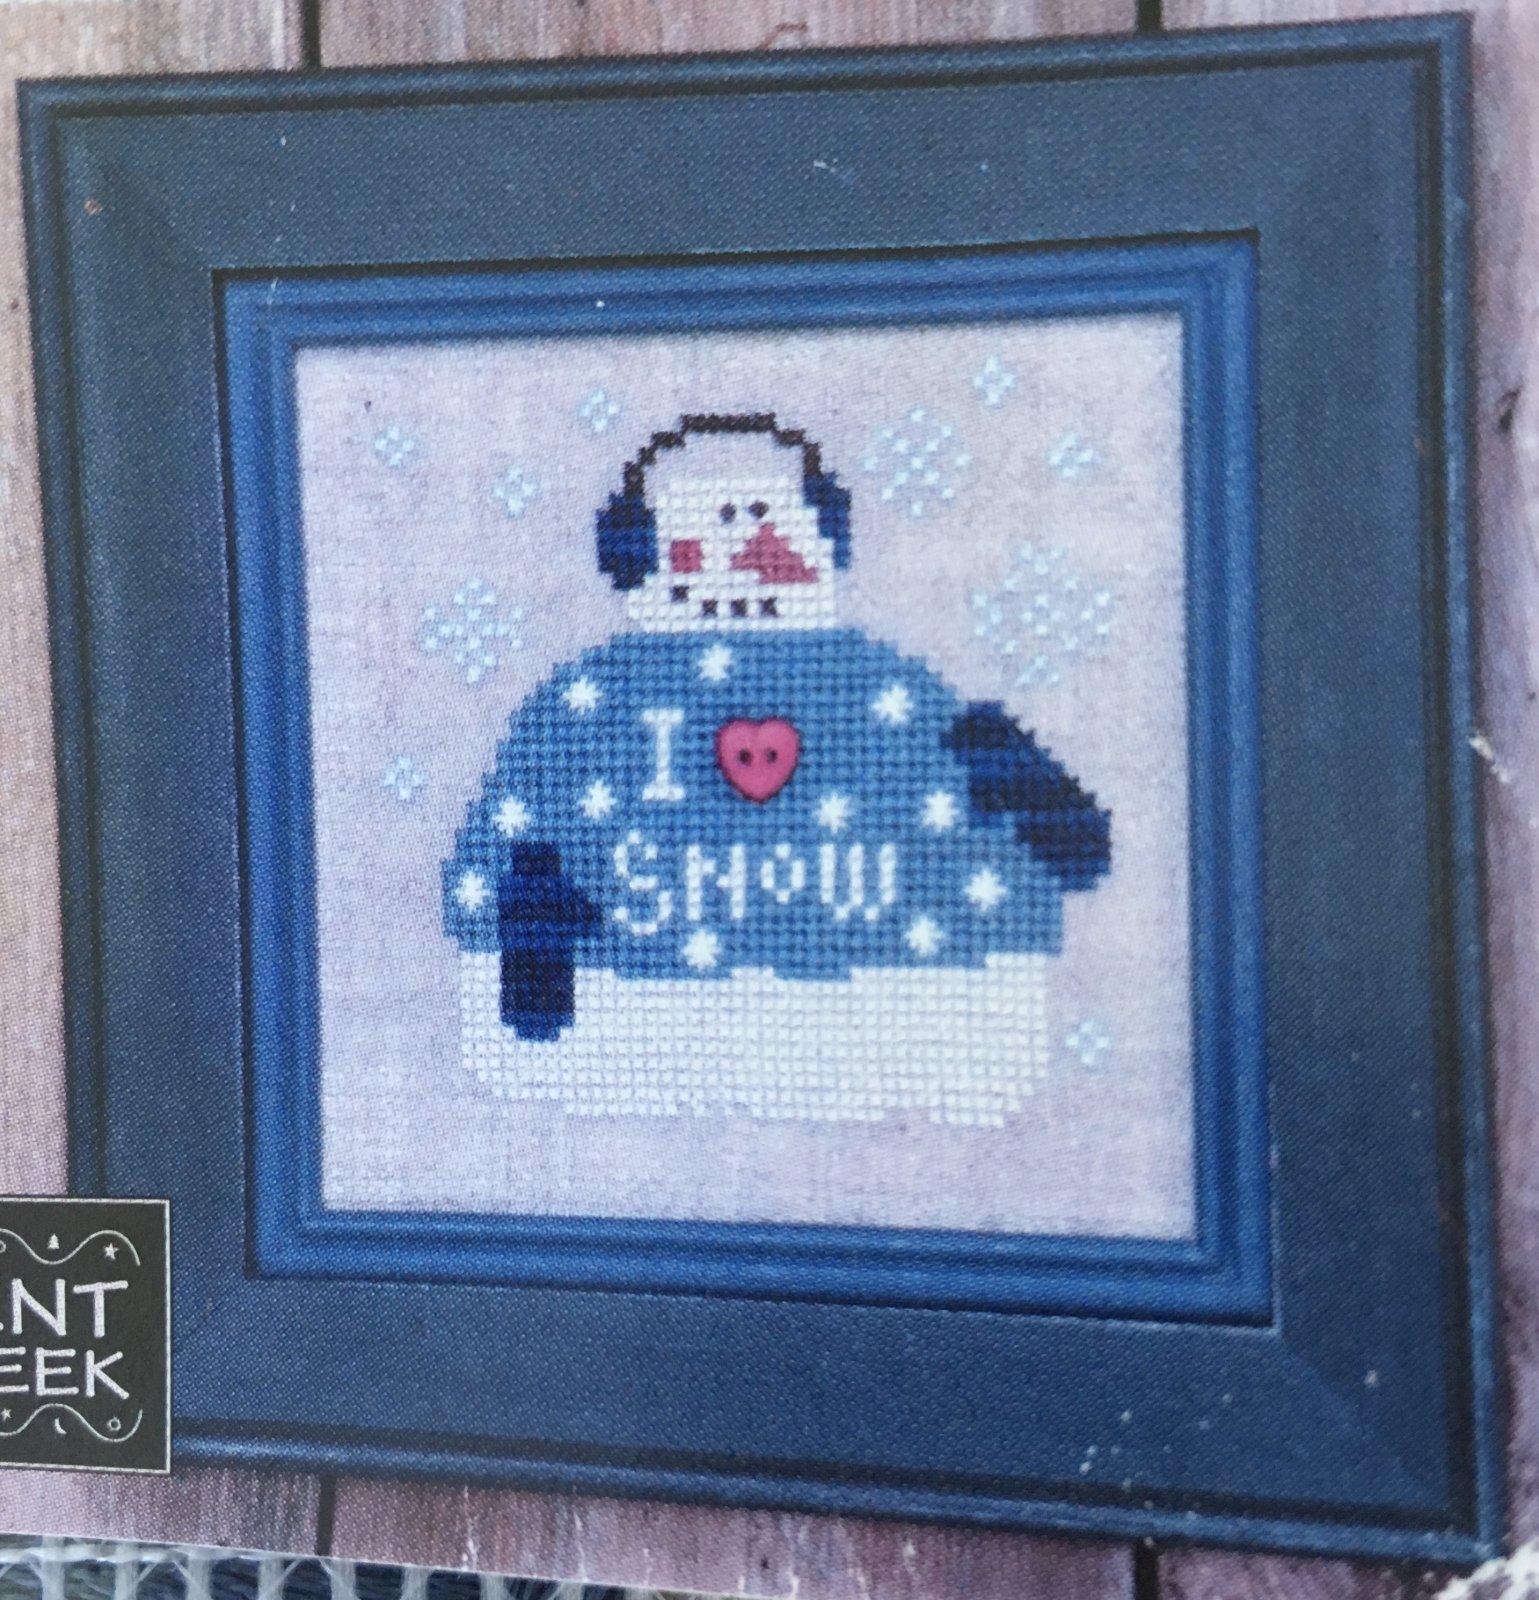 Bent Creek: I Love Snow Zipper Kit